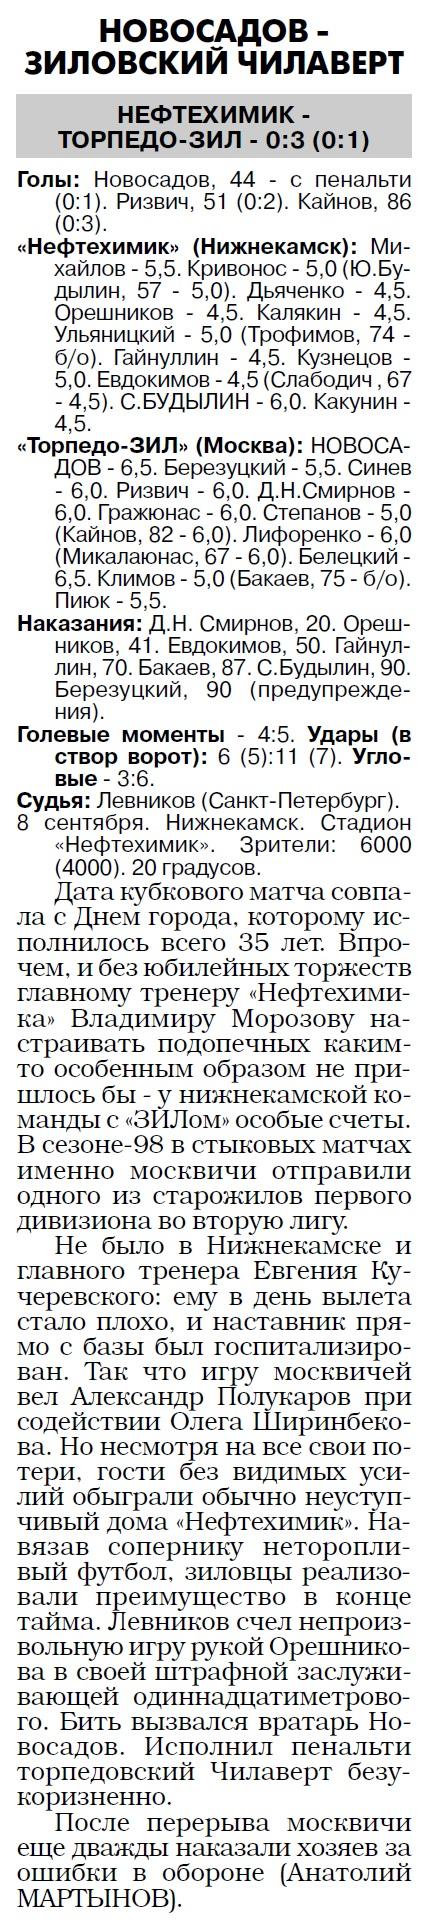 Нефтехимик (Нижнекамск) - Торпедо-ЗИЛ (Москва) 0:3